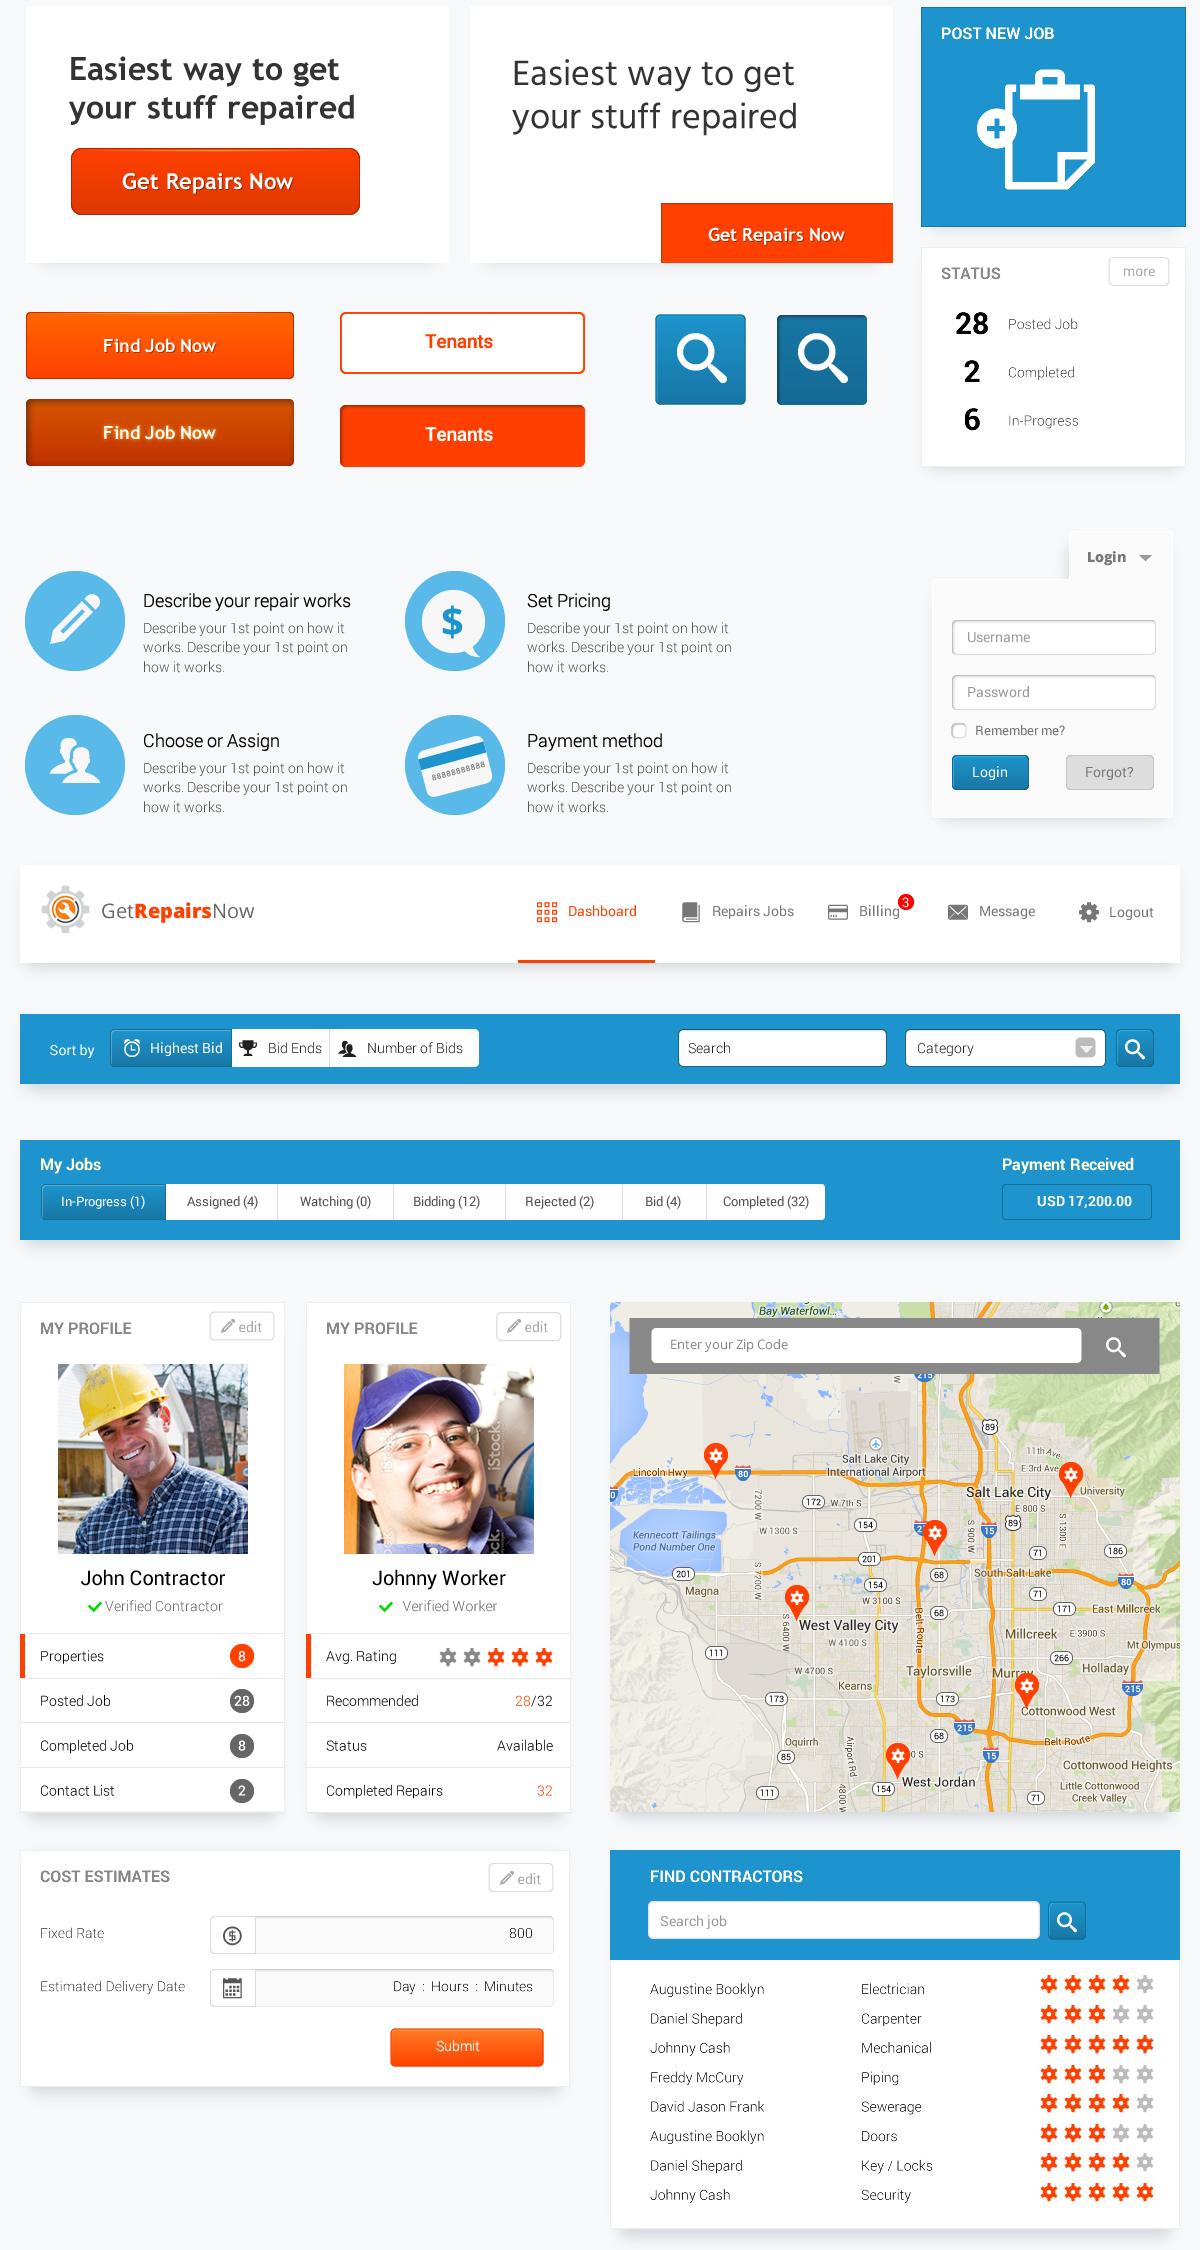 getrepairs-user-interface-design-elements